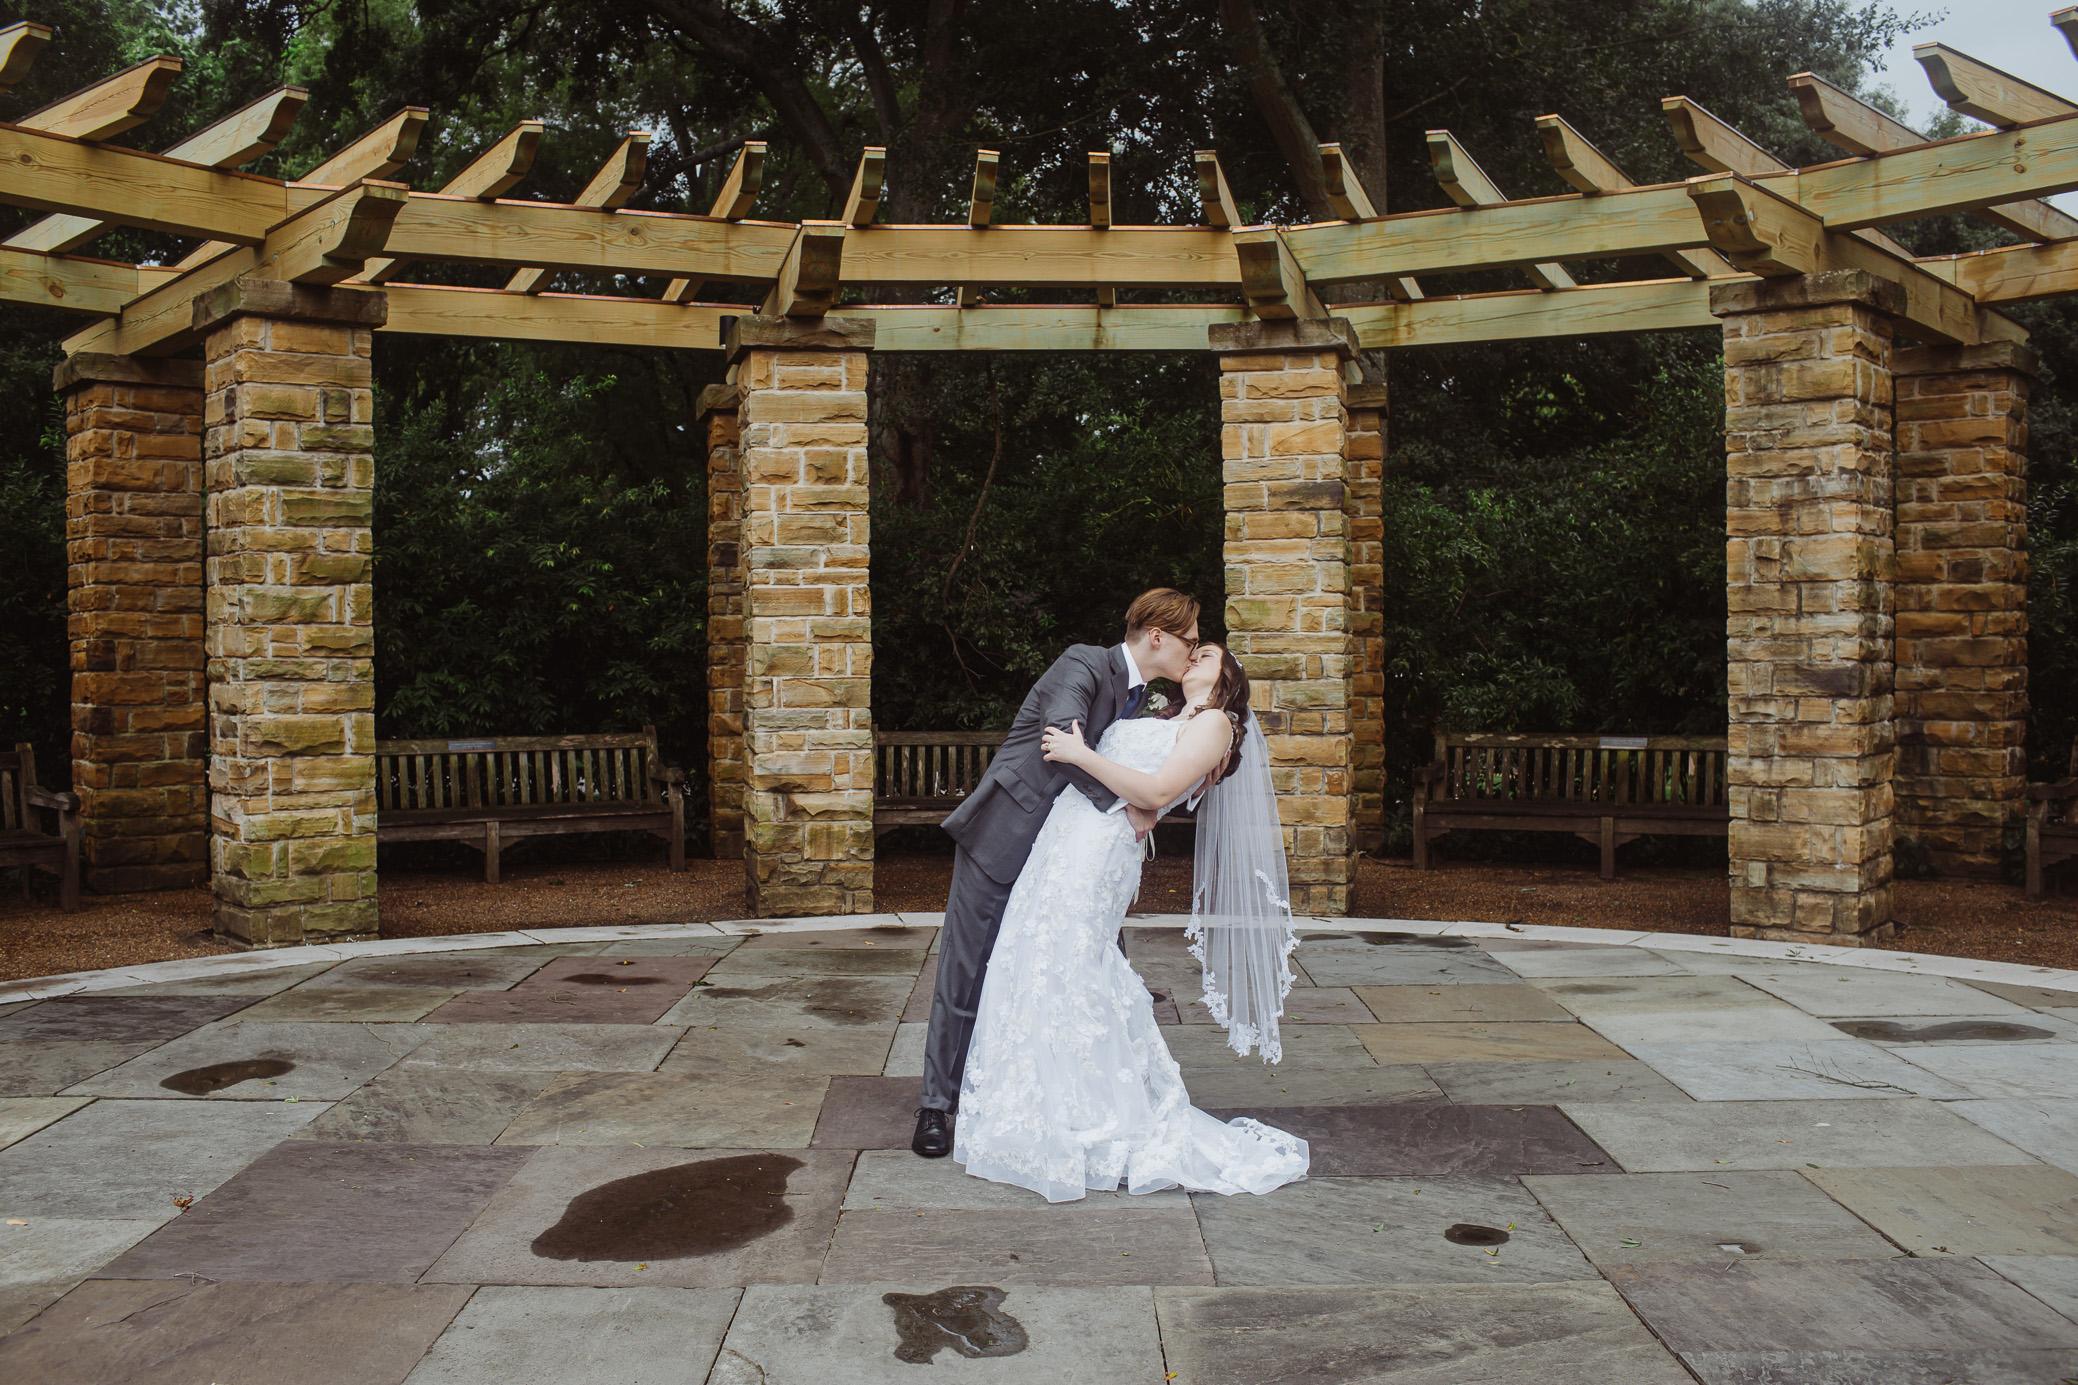 Boise Idaho wedding photography by David A. Smith of DSmithImages Wedding Photography, Portraits, and Events, a wedding photographer in Birmingham, Alabama